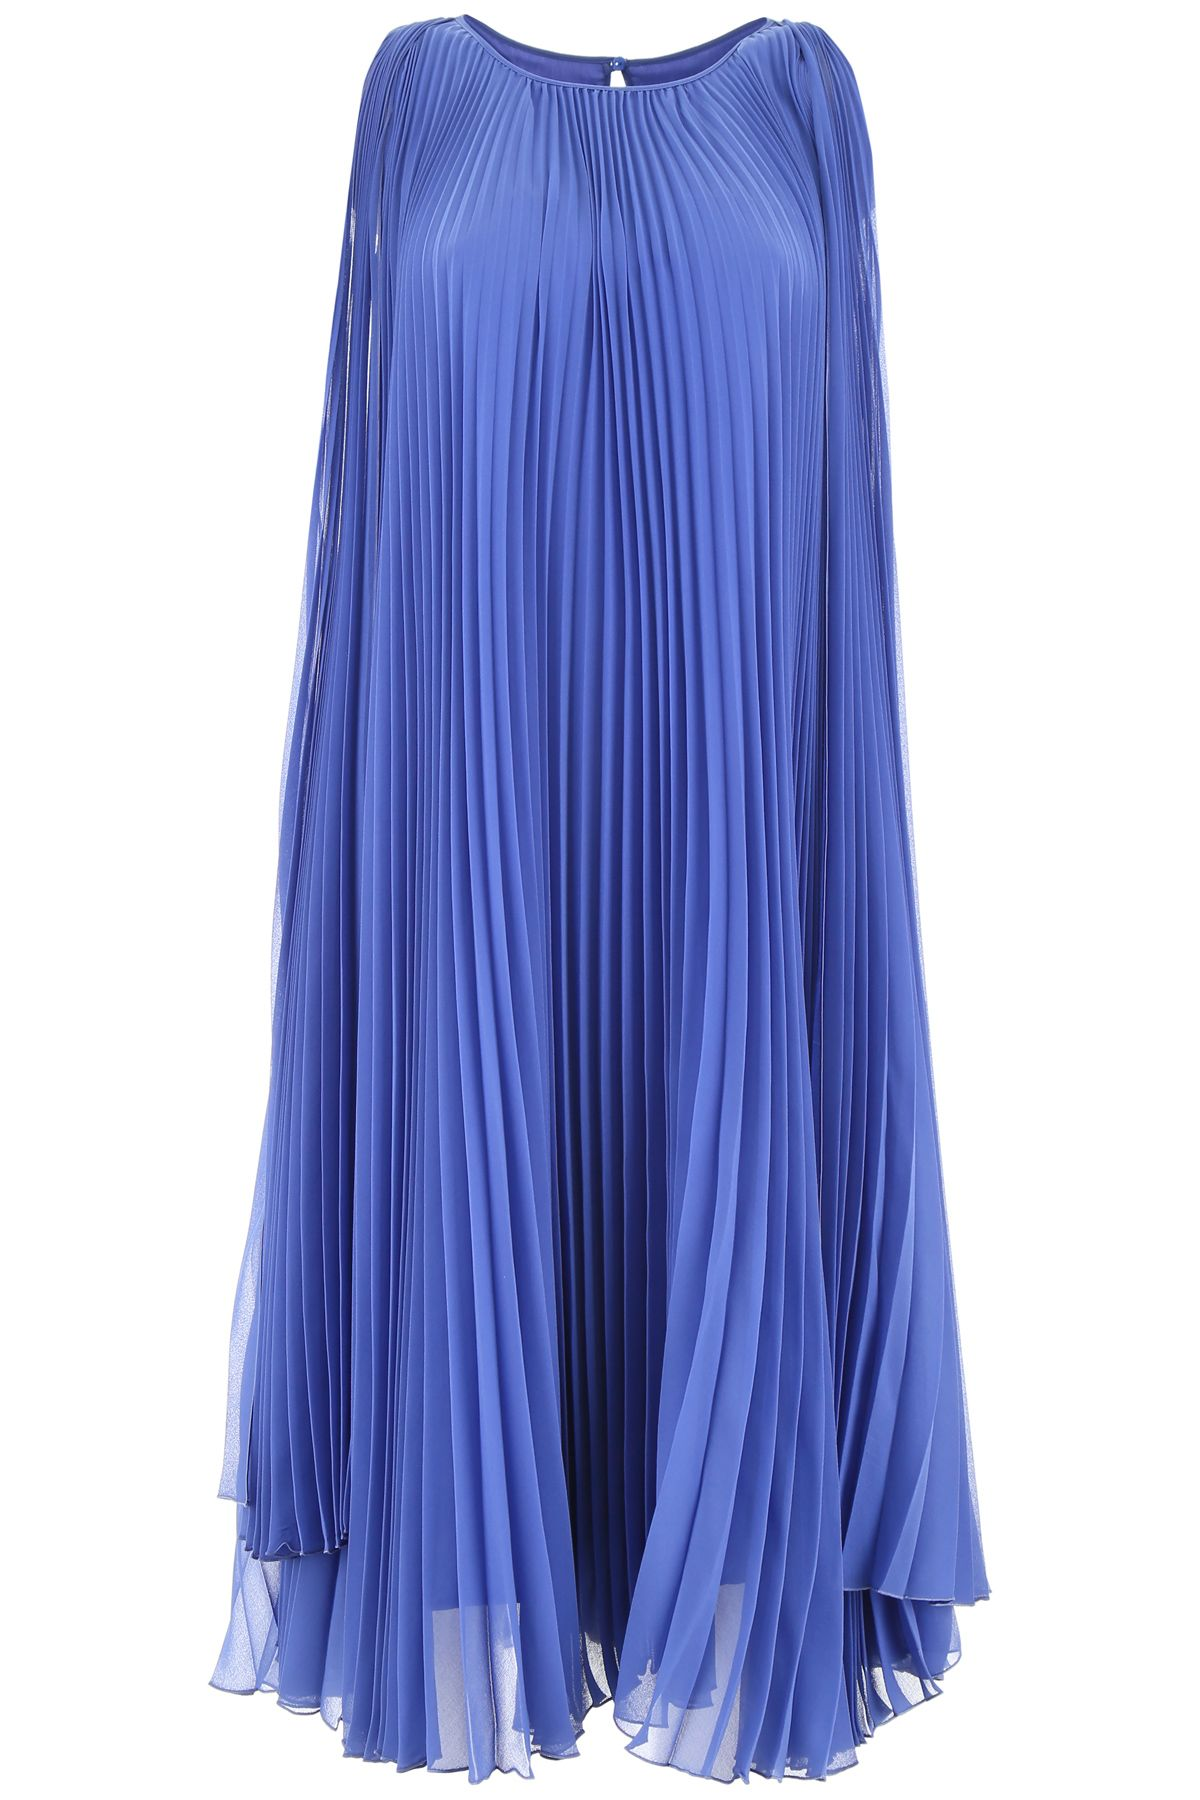 Max Mara Dresses PLEATED GEORGETTE DRESS